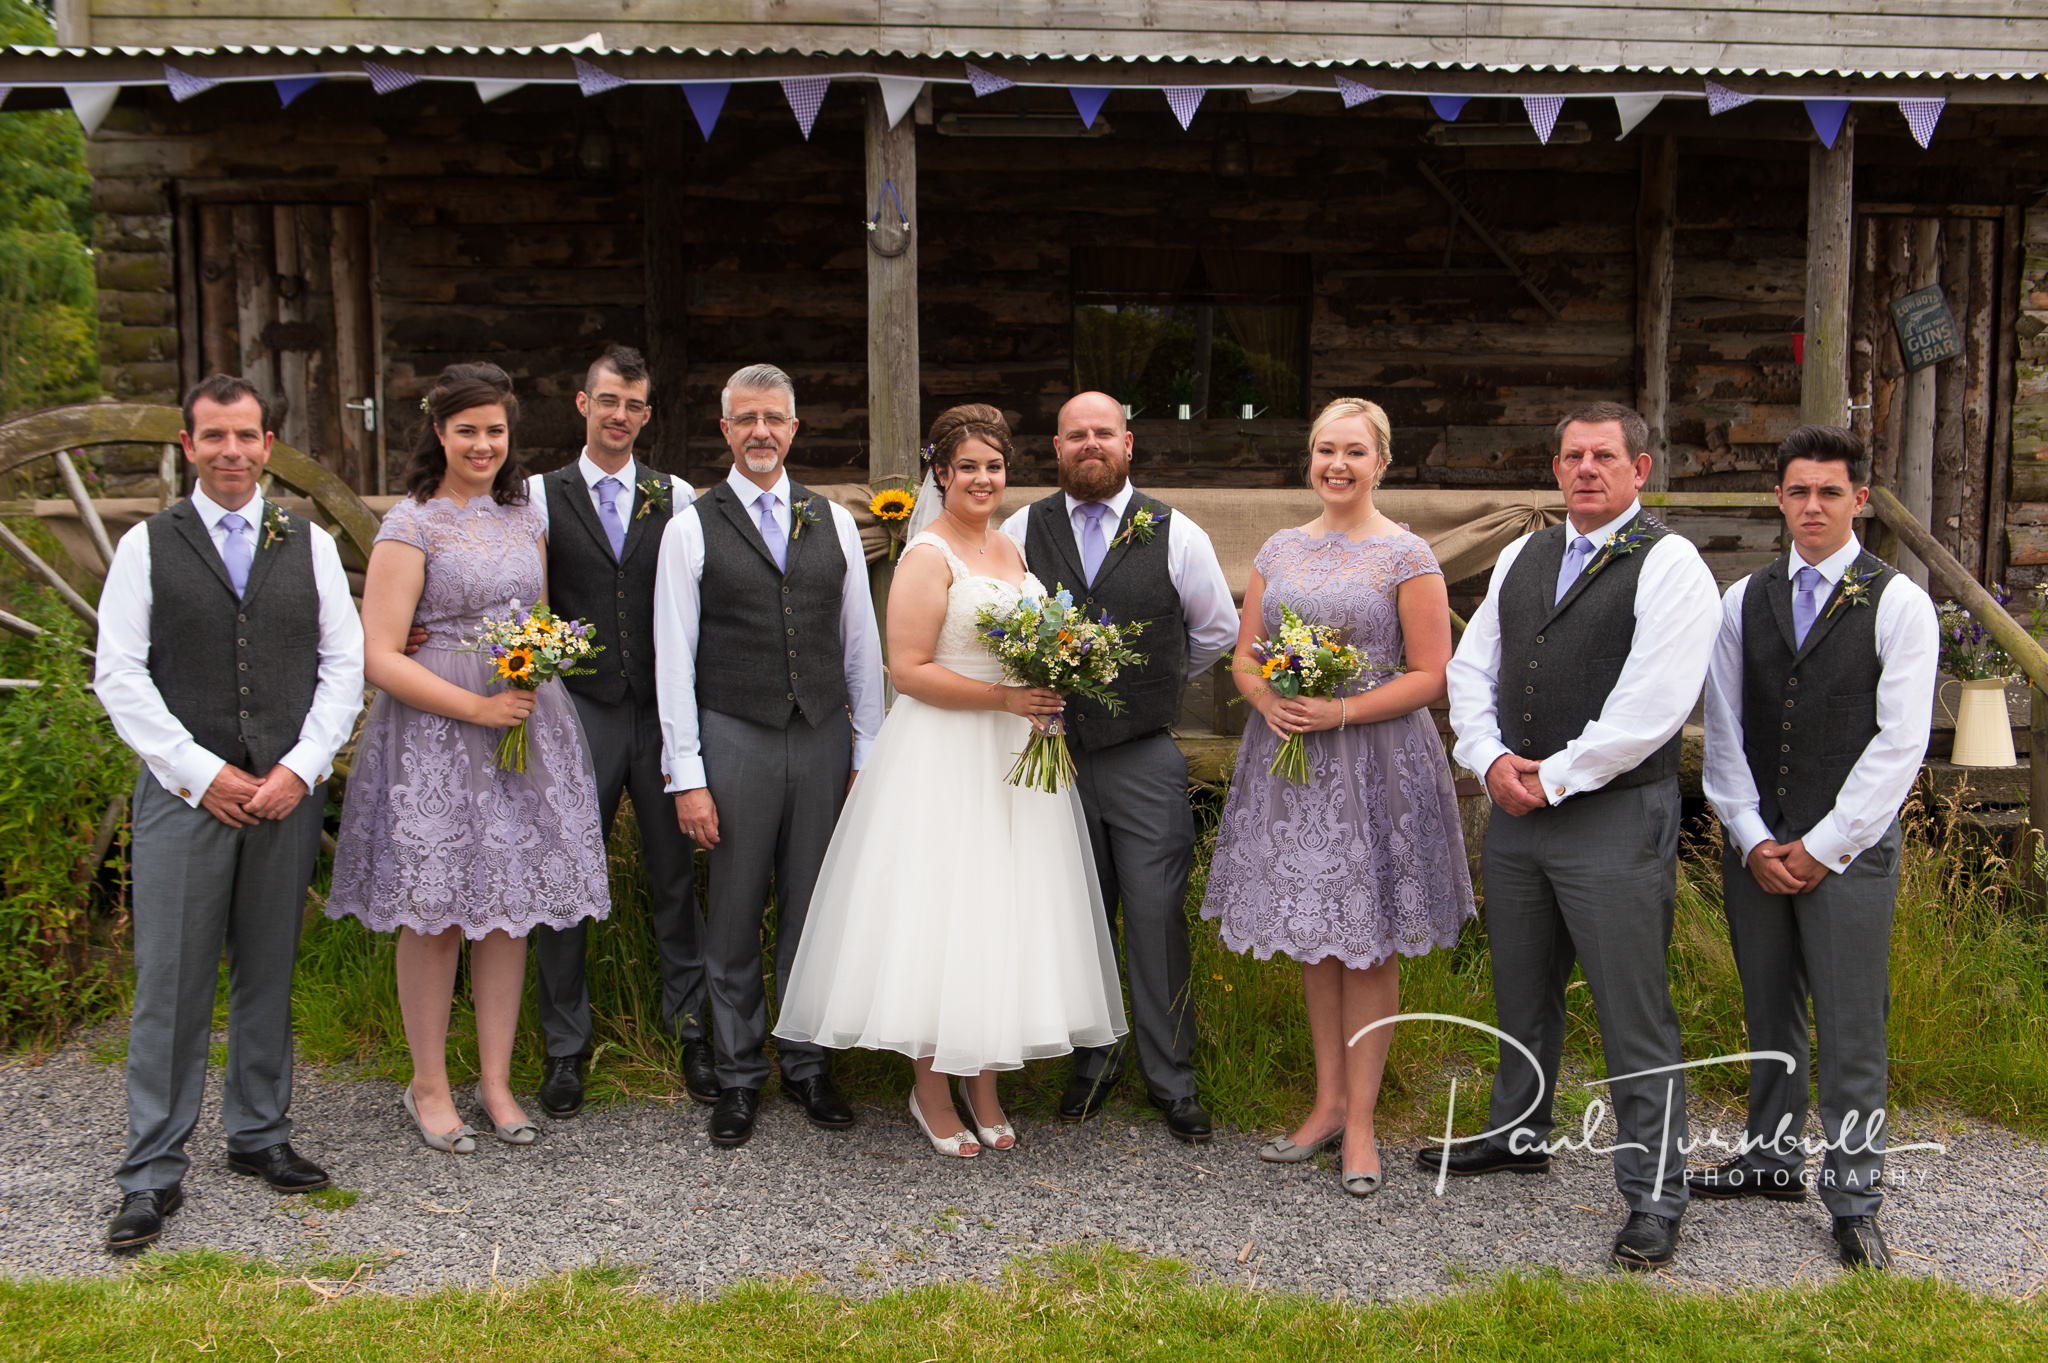 wedding-photographer-hilltop-farm-ilton-yorkshire-028.jpg